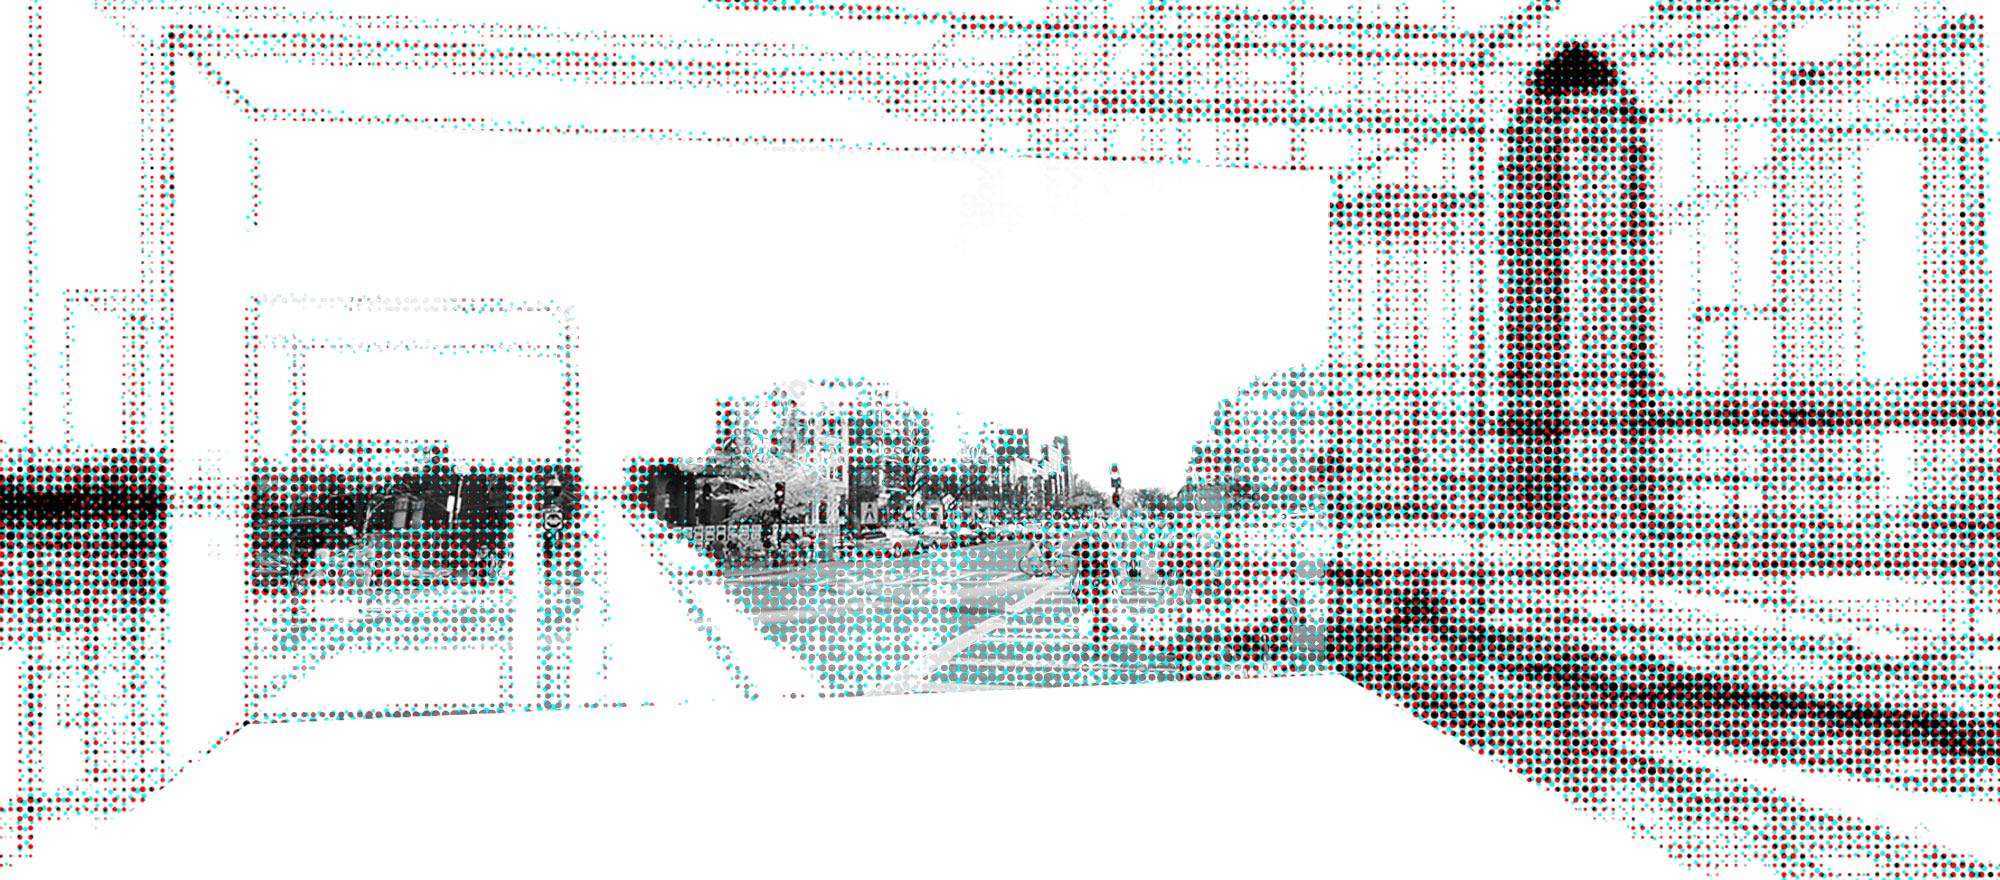 simultaneous-views